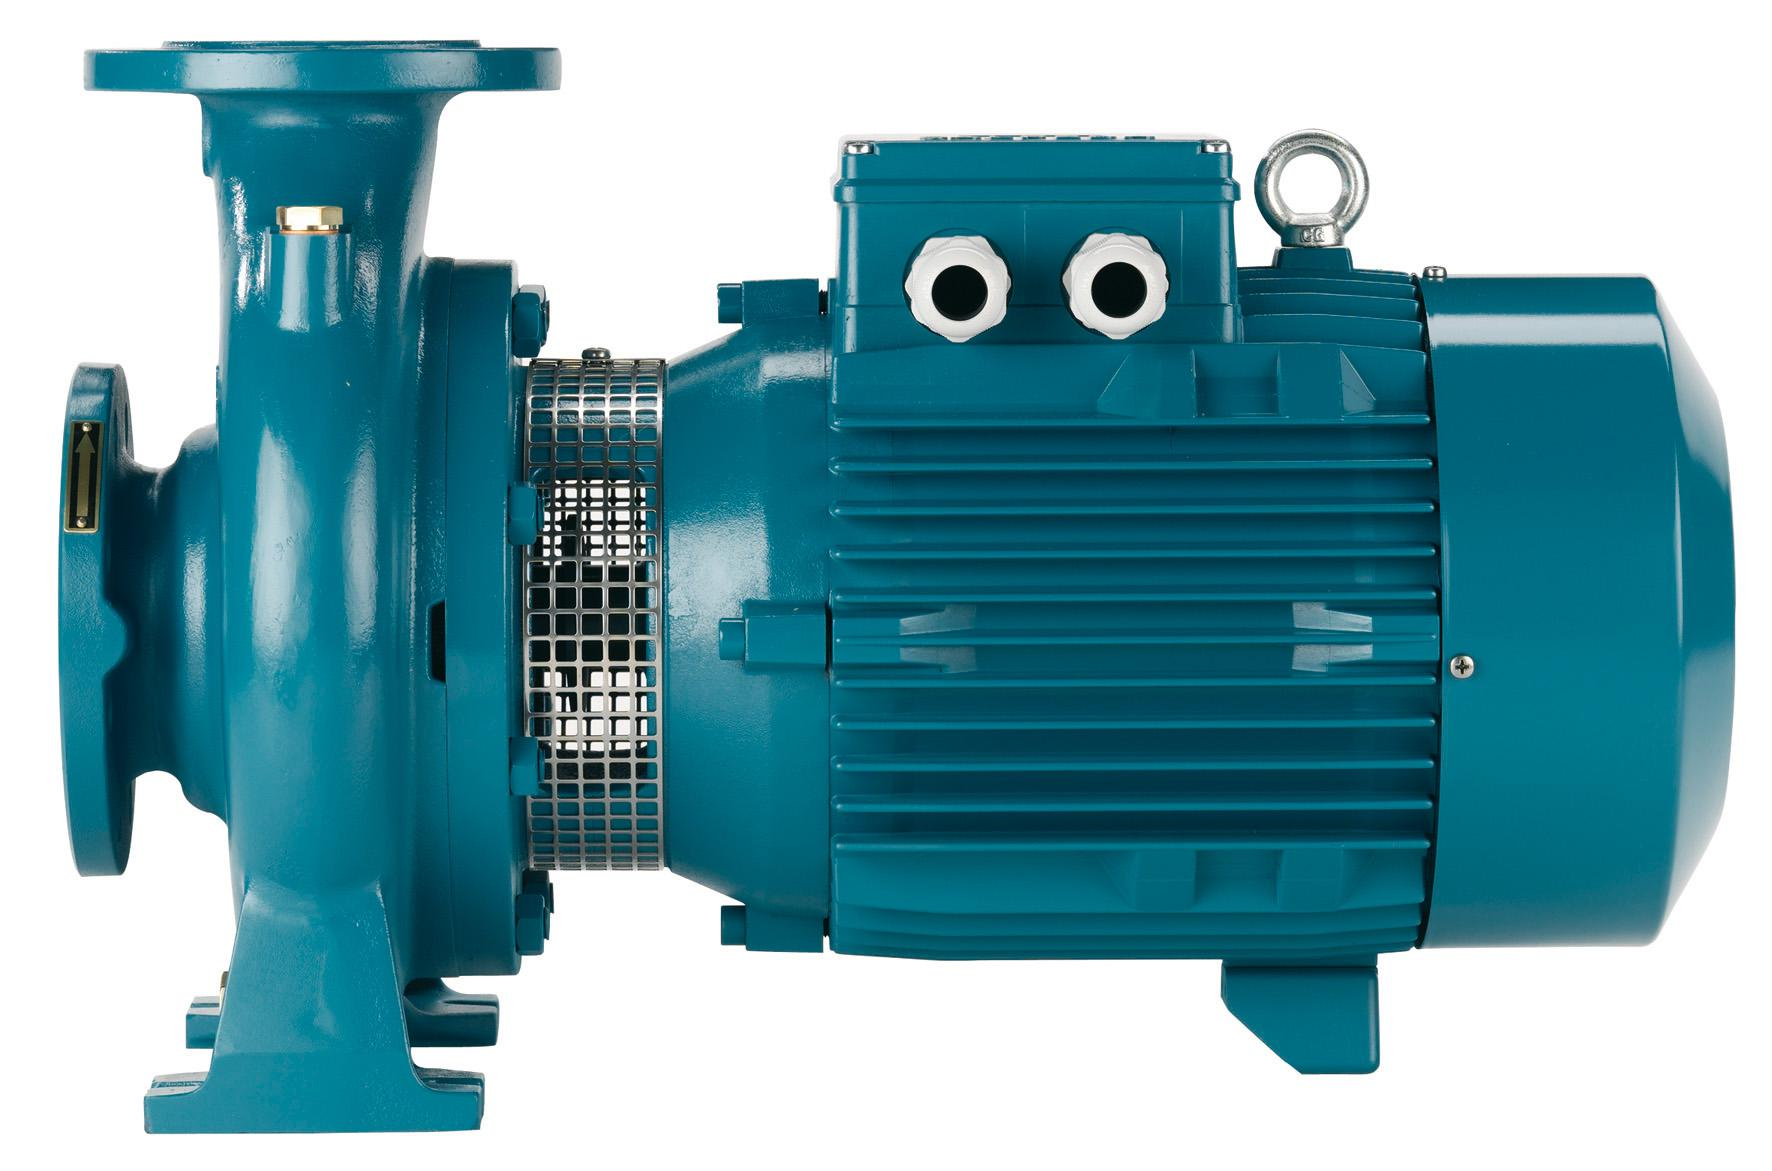 Насос Calpeda Nm 100/200e/b 400/690/50 hz насос calpeda nm 25 20s b 400 690 50 hz